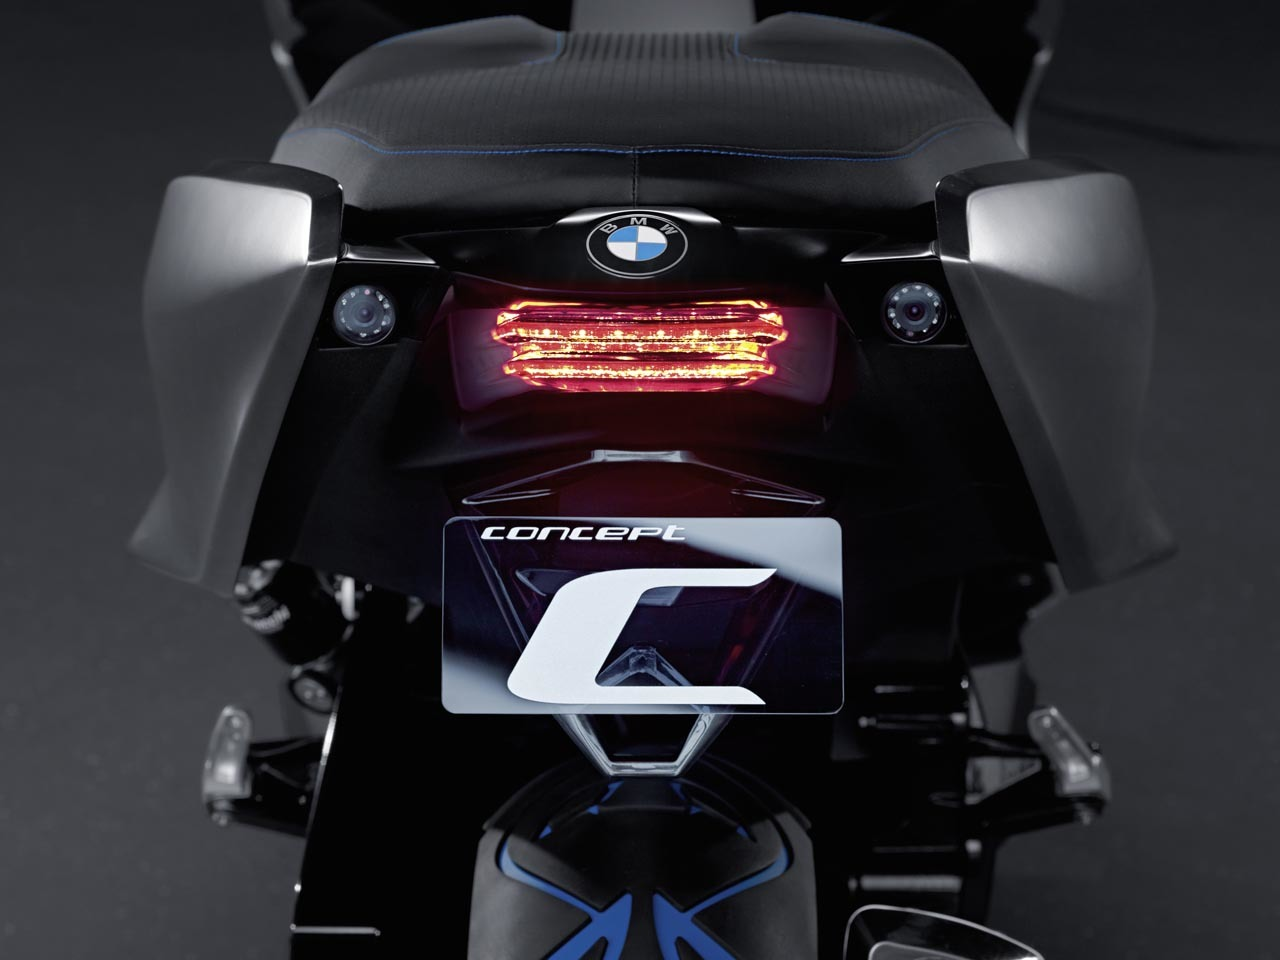 Foto de BMW Concept C Scooter, el Scooter del futuro según BMW (16/19)